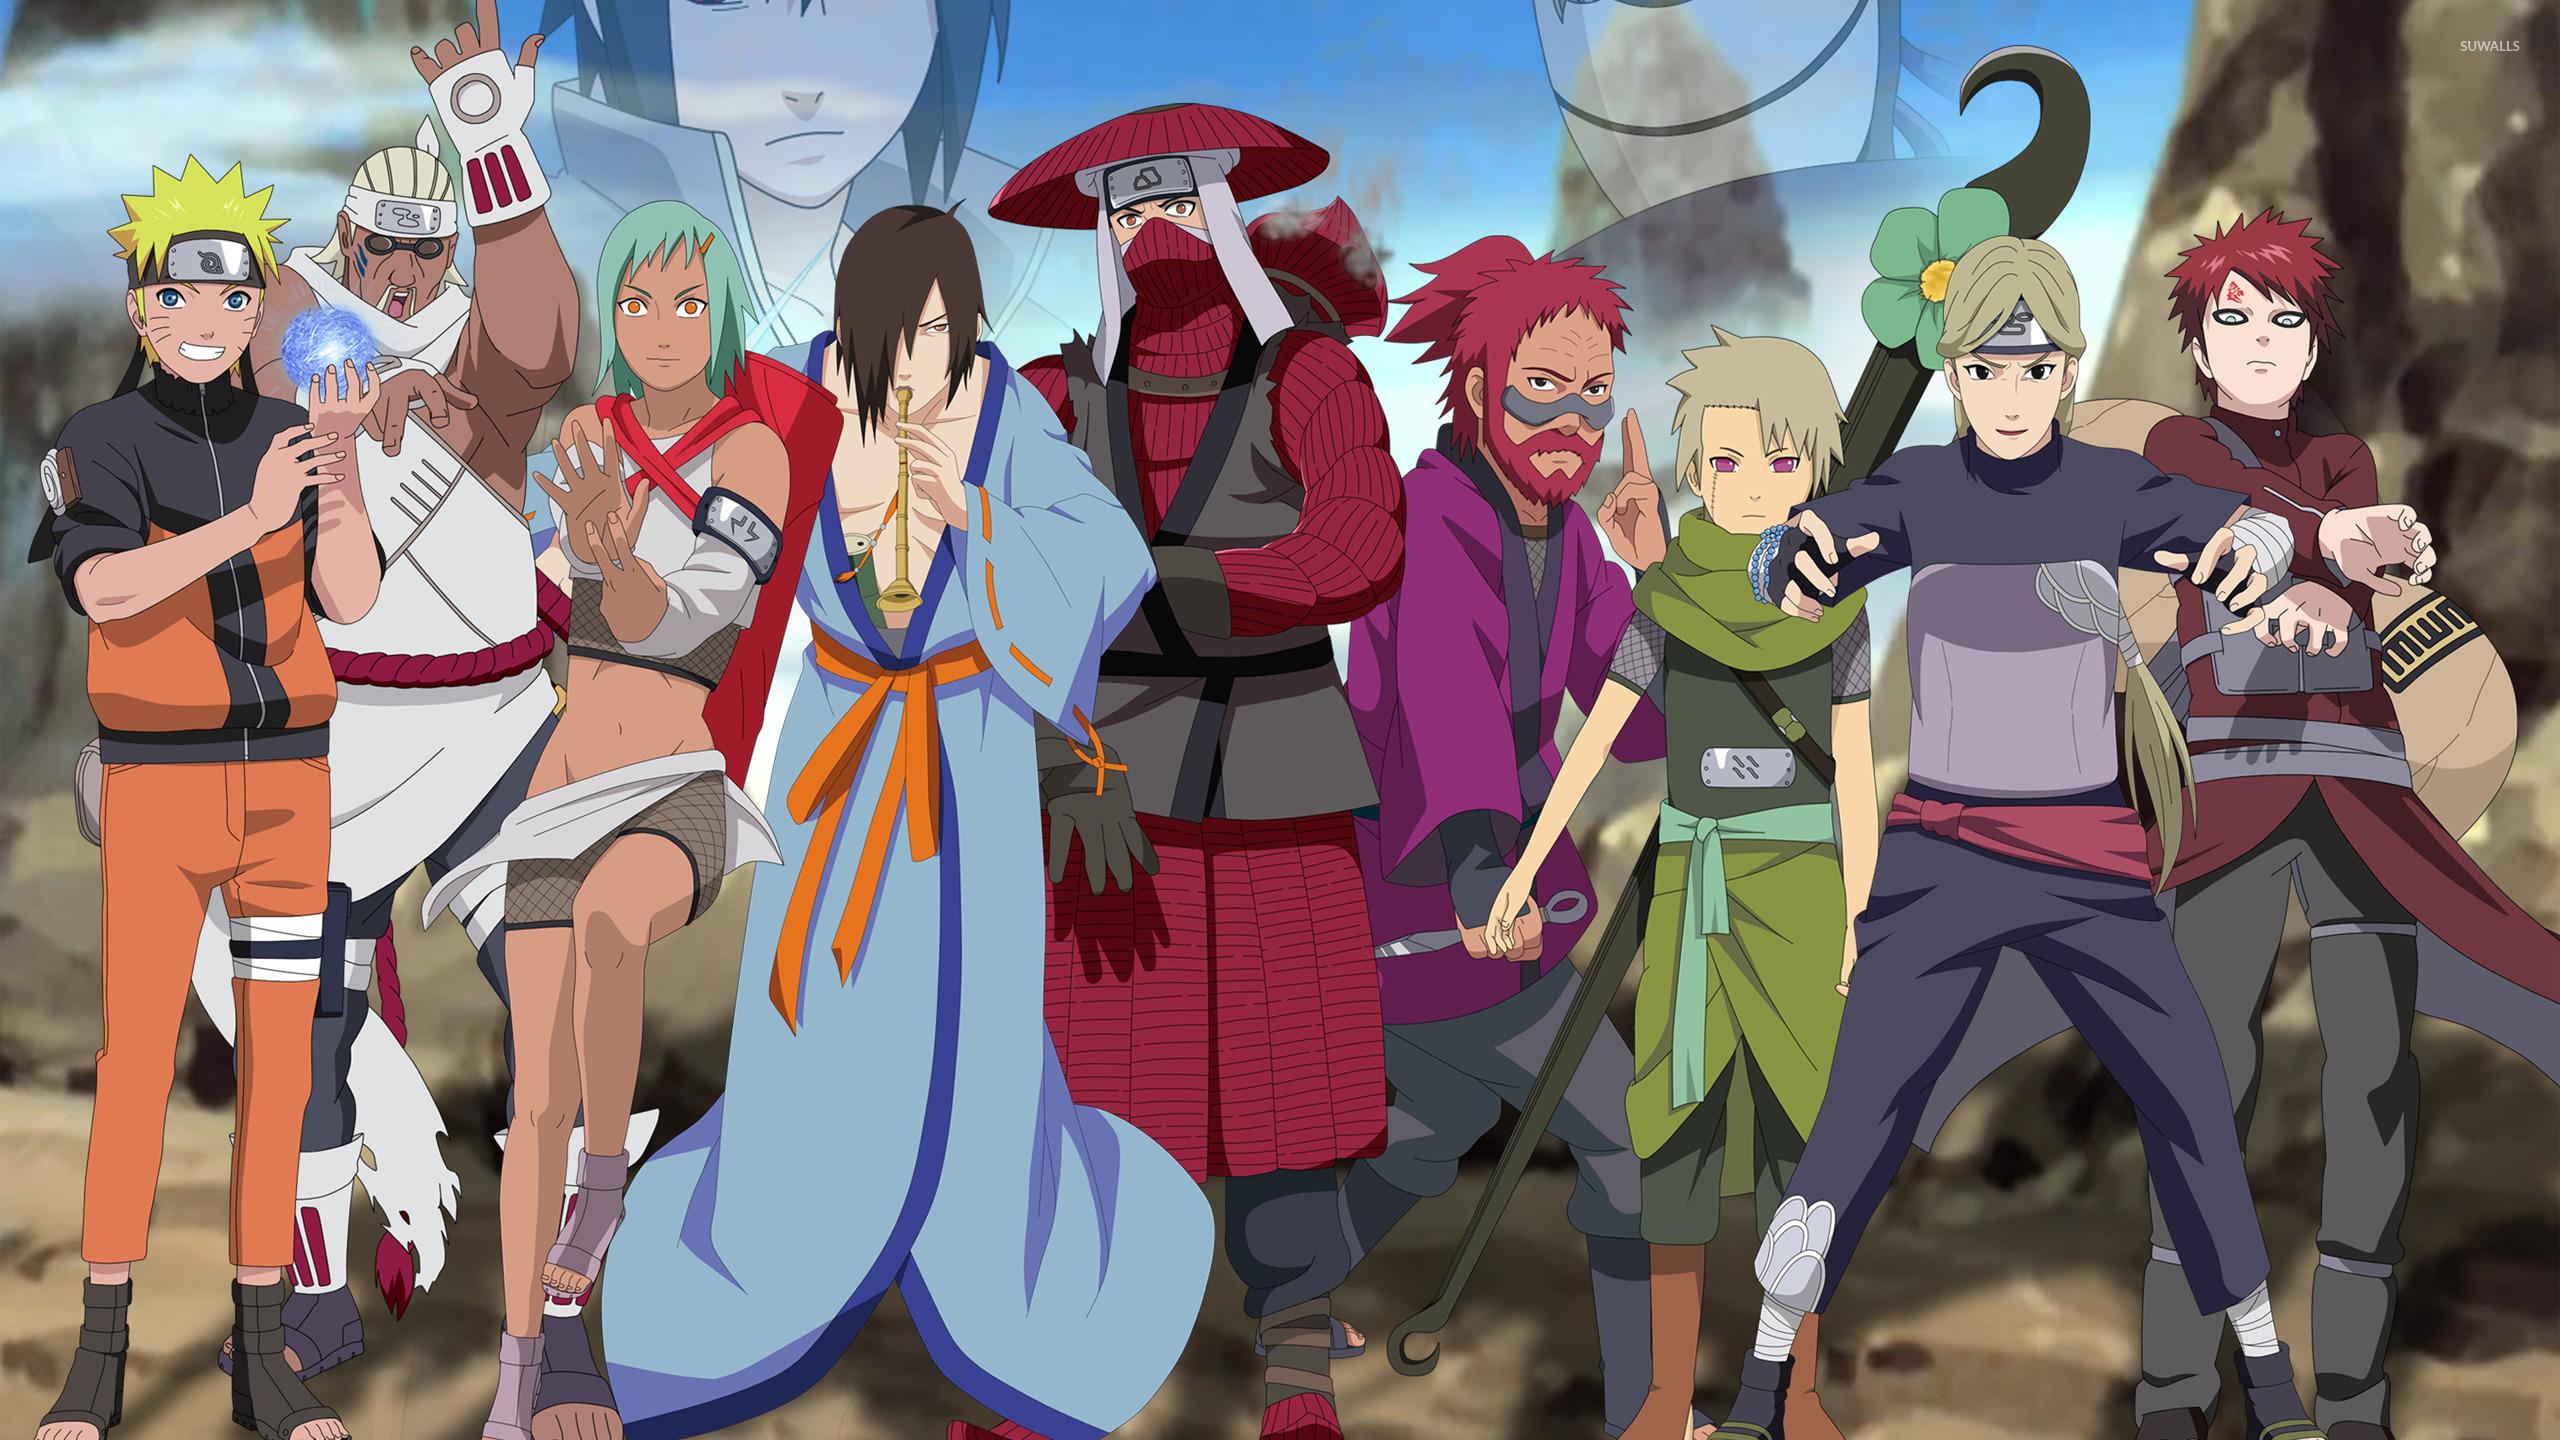 Naruto Shippuden wallpaper   Anime wallpapers   18409 2560x1440